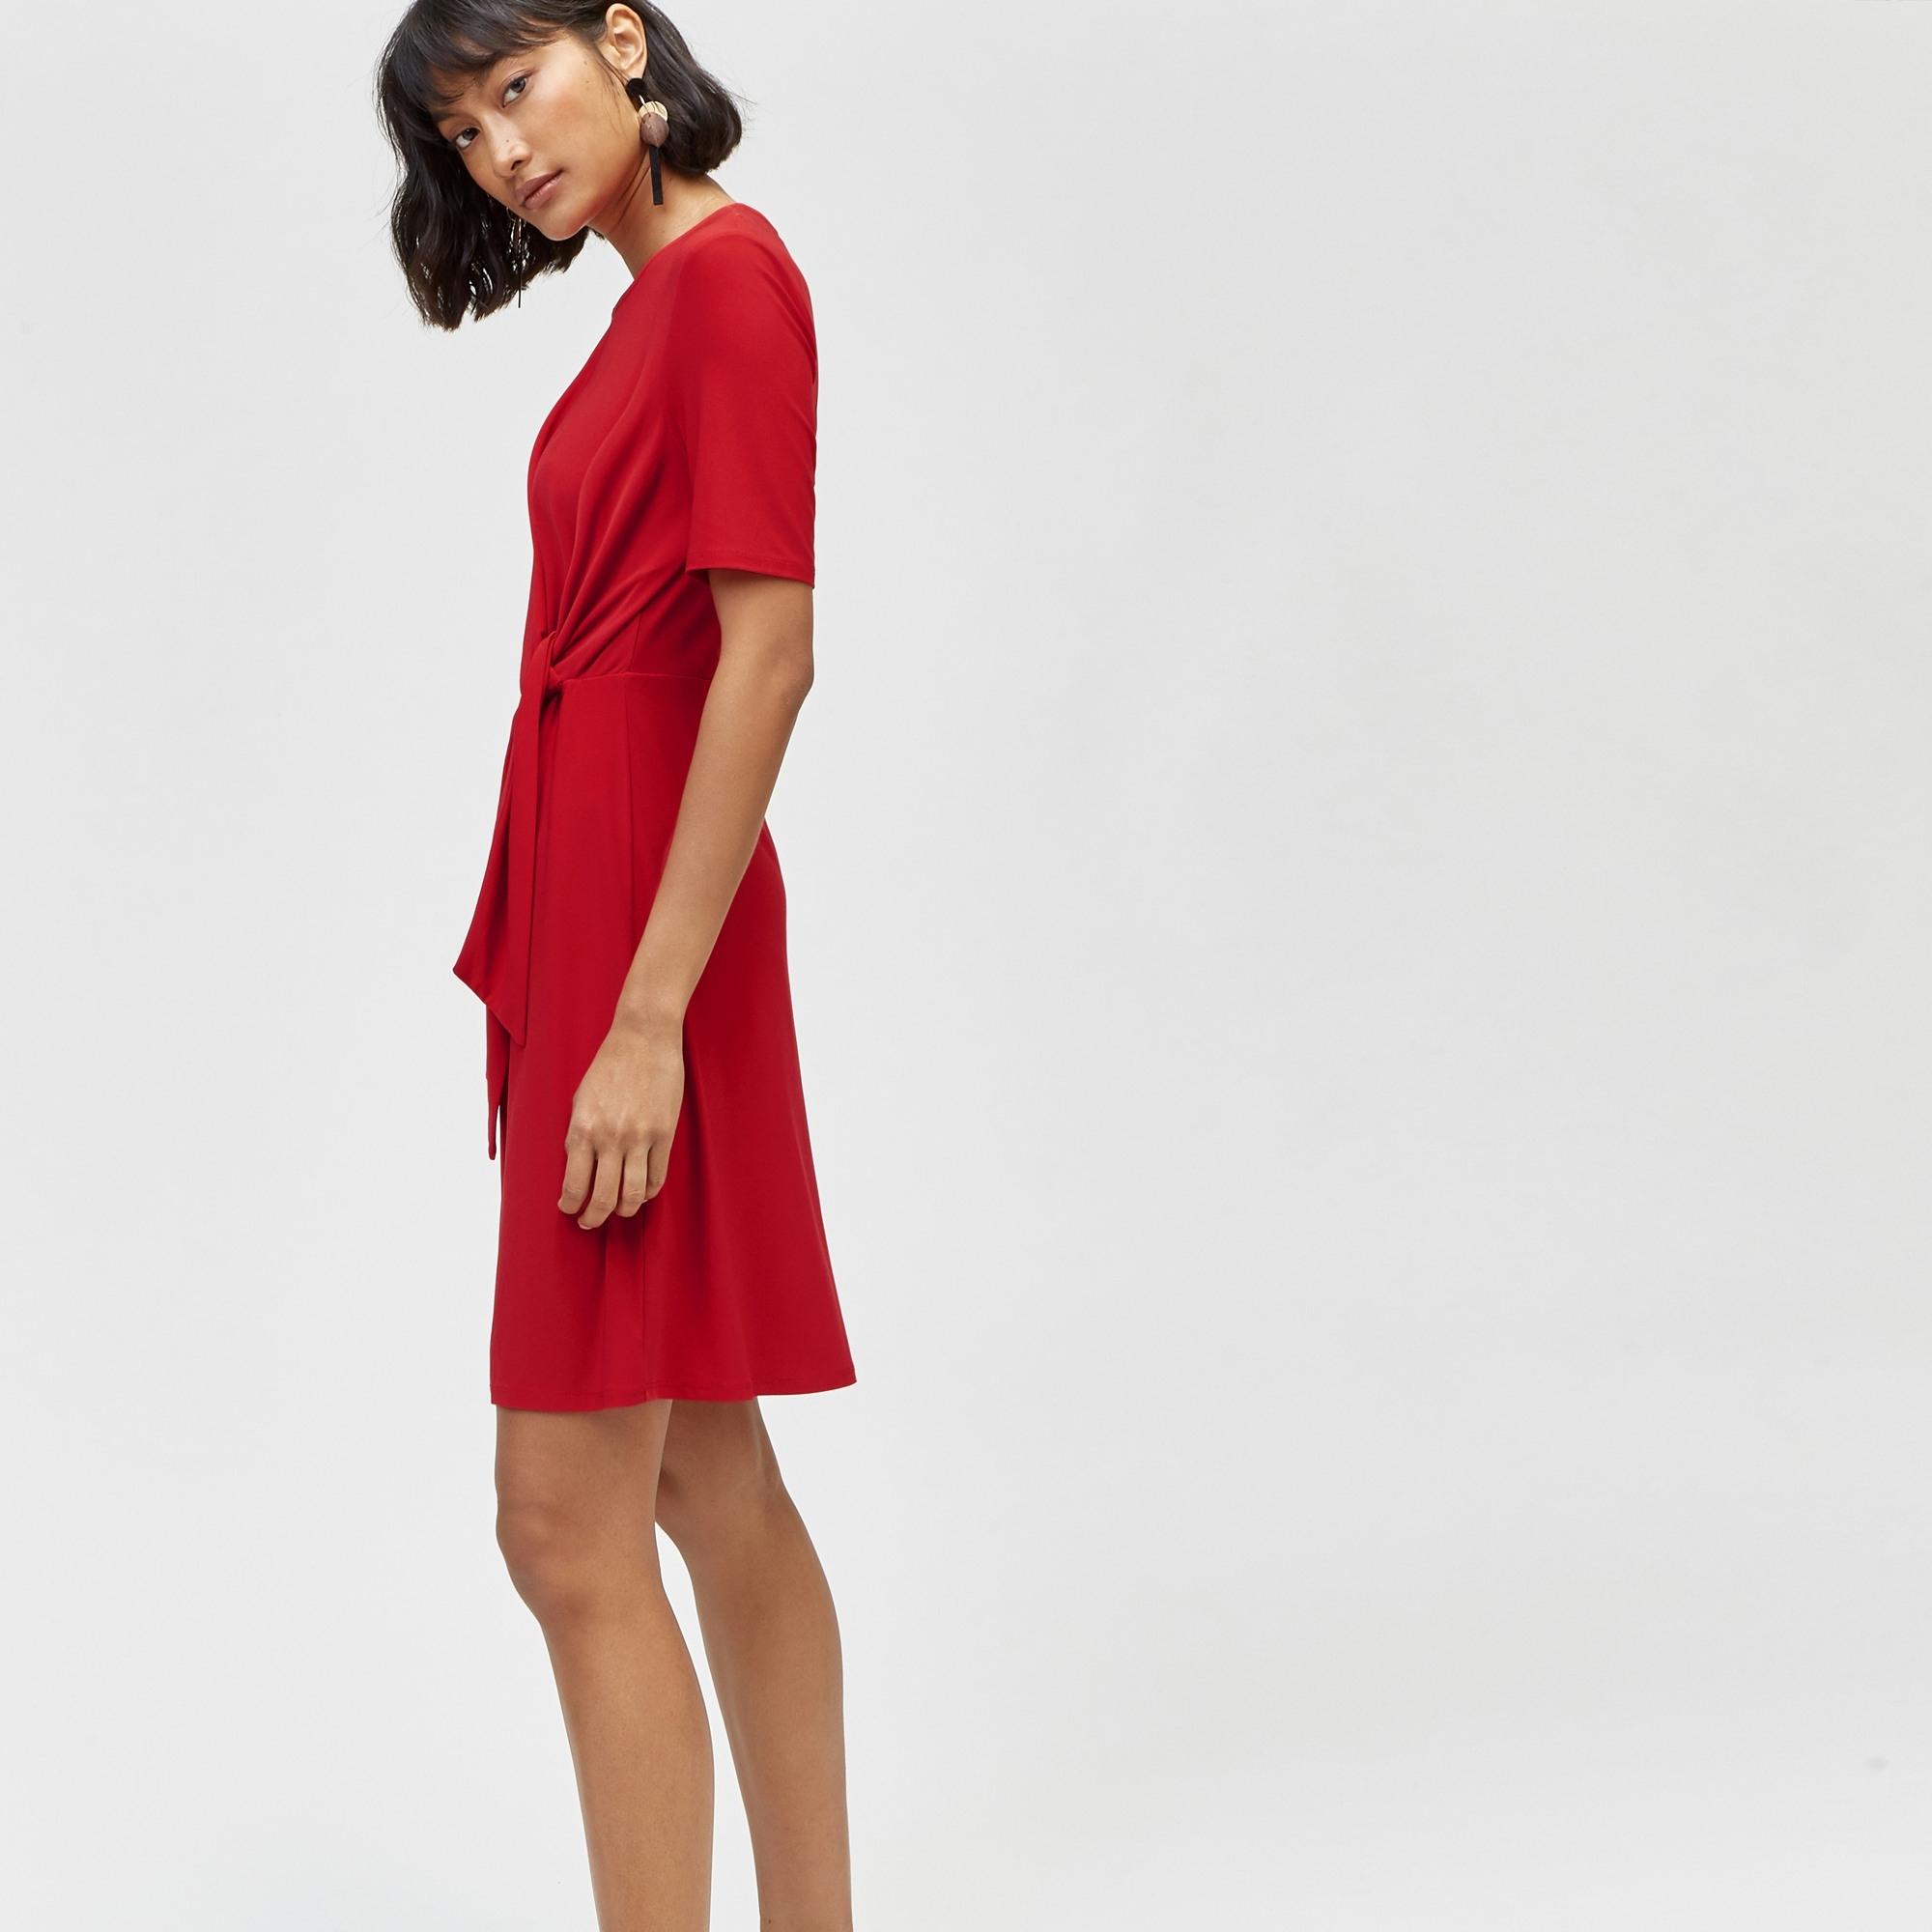 Abend Kreativ Kurzes Kleid Design10 Spektakulär Kurzes Kleid Ärmel